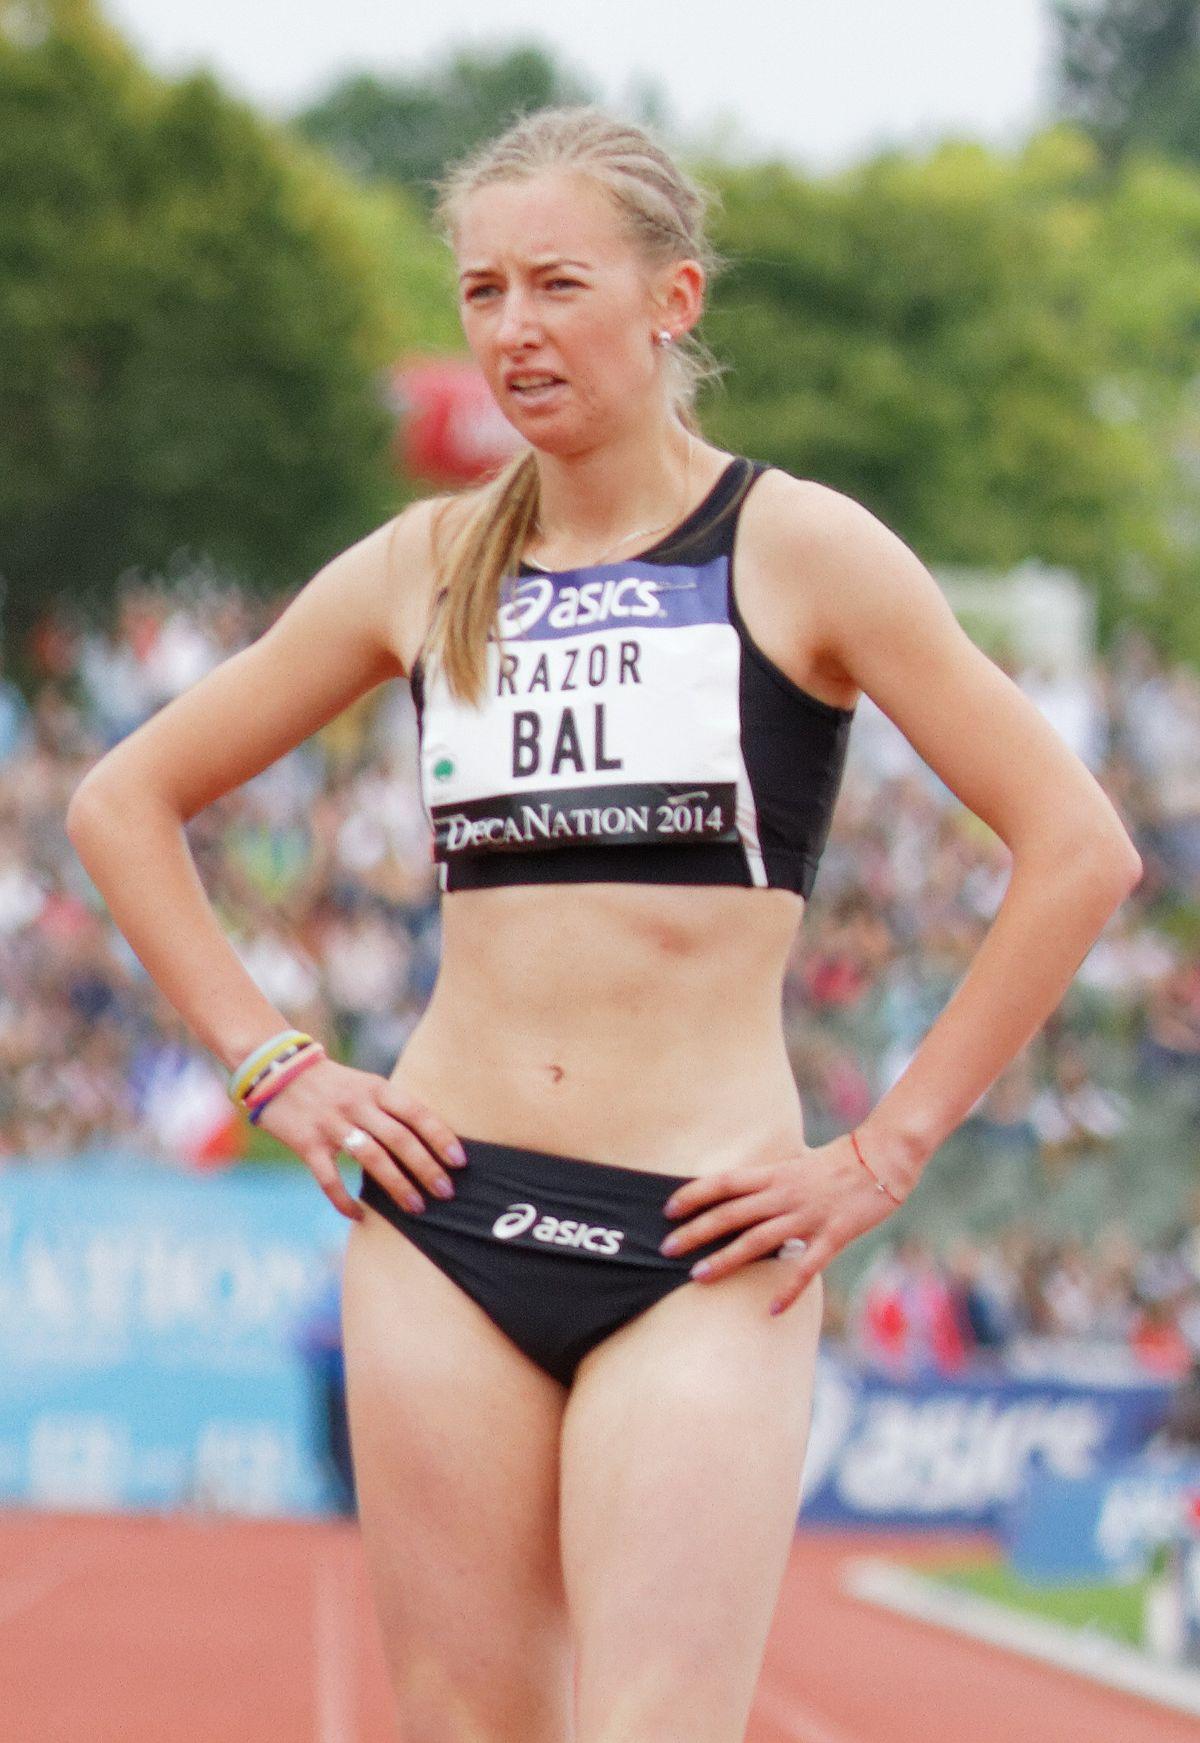 Bianca Răzor - Wikipedia